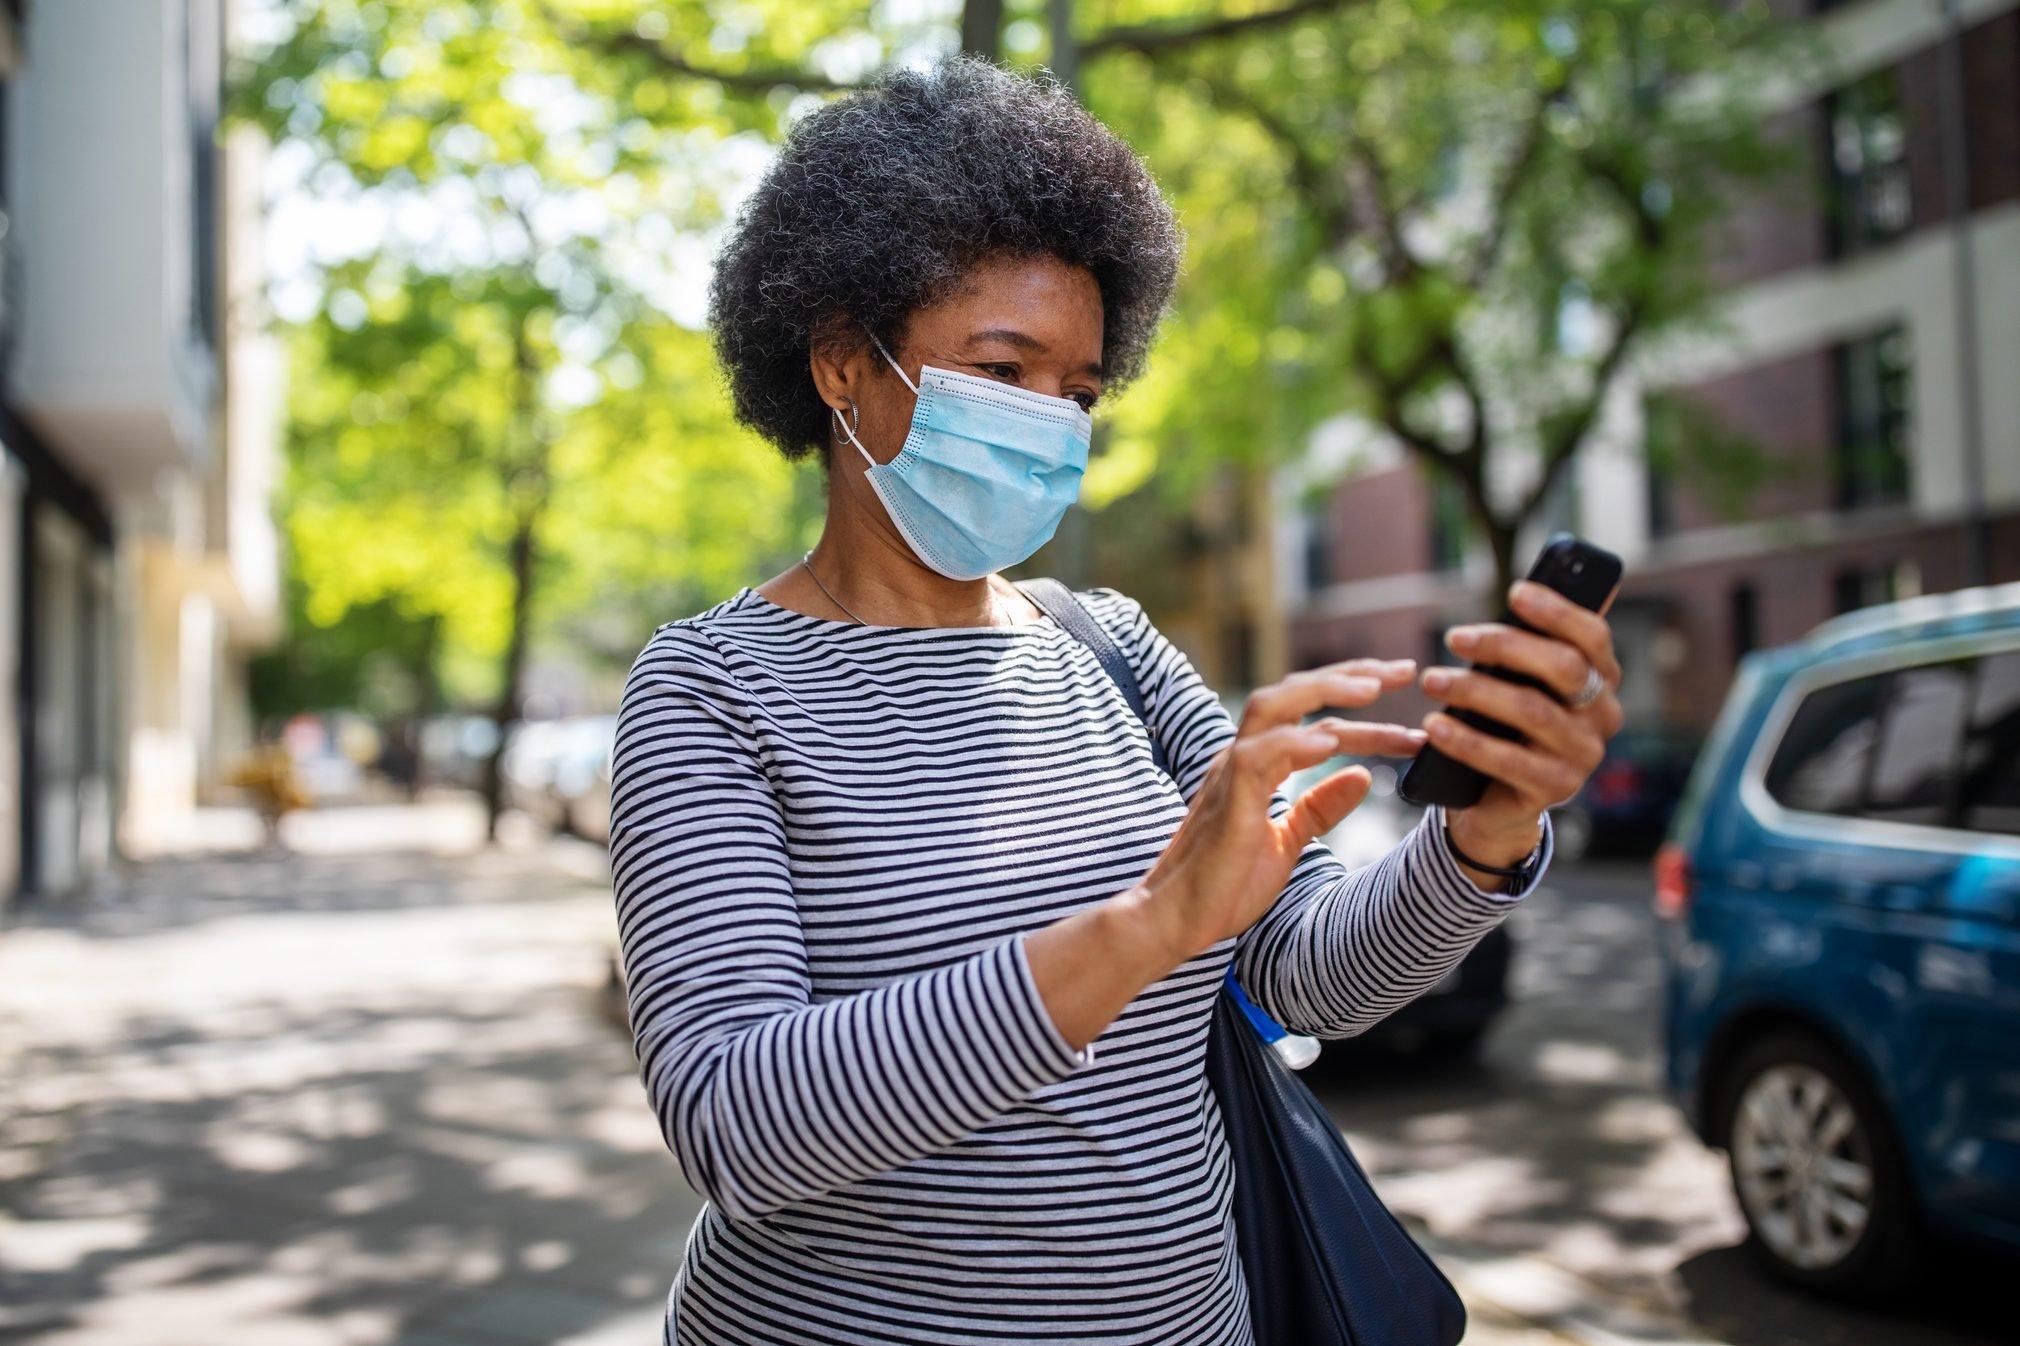 Woman walking on the street during corona virus outbreak using phone